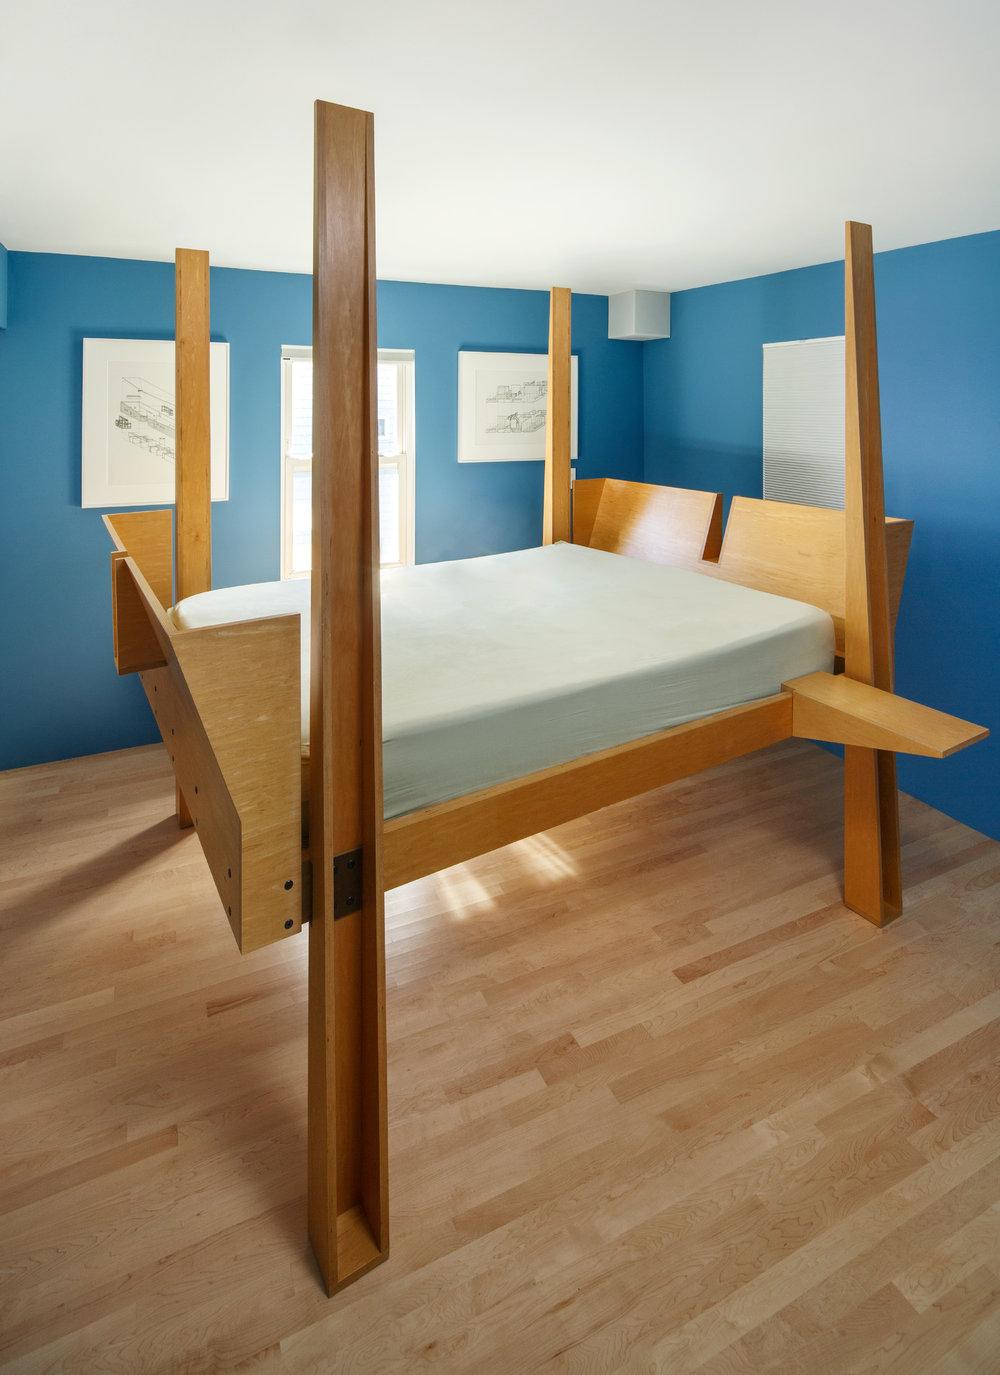 Furniture Glyph Ark Bed 2.jpg